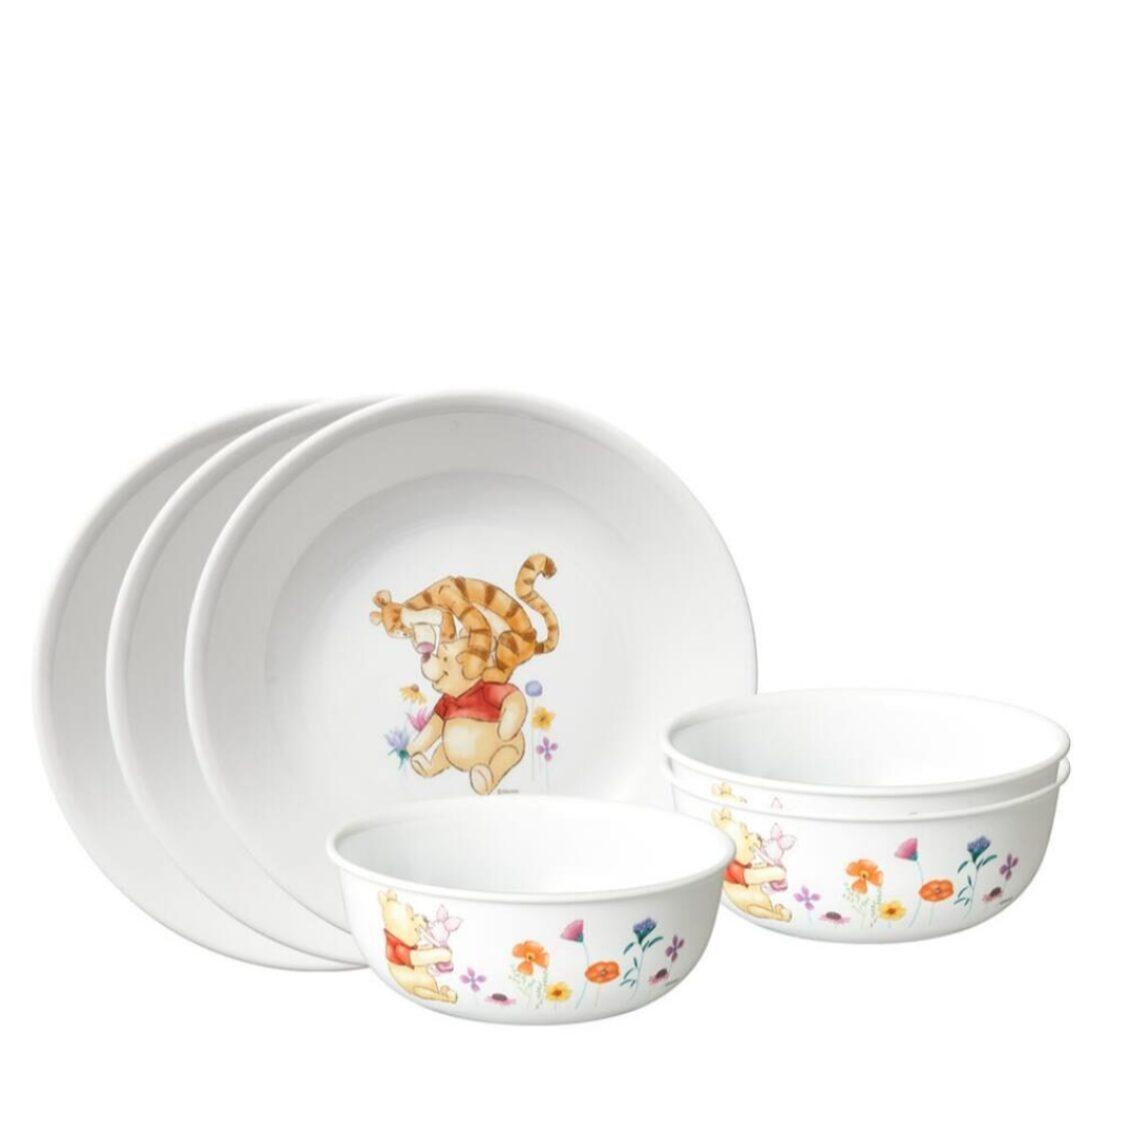 Corelle 6pc Dinner Set A - Winnie The Pooh